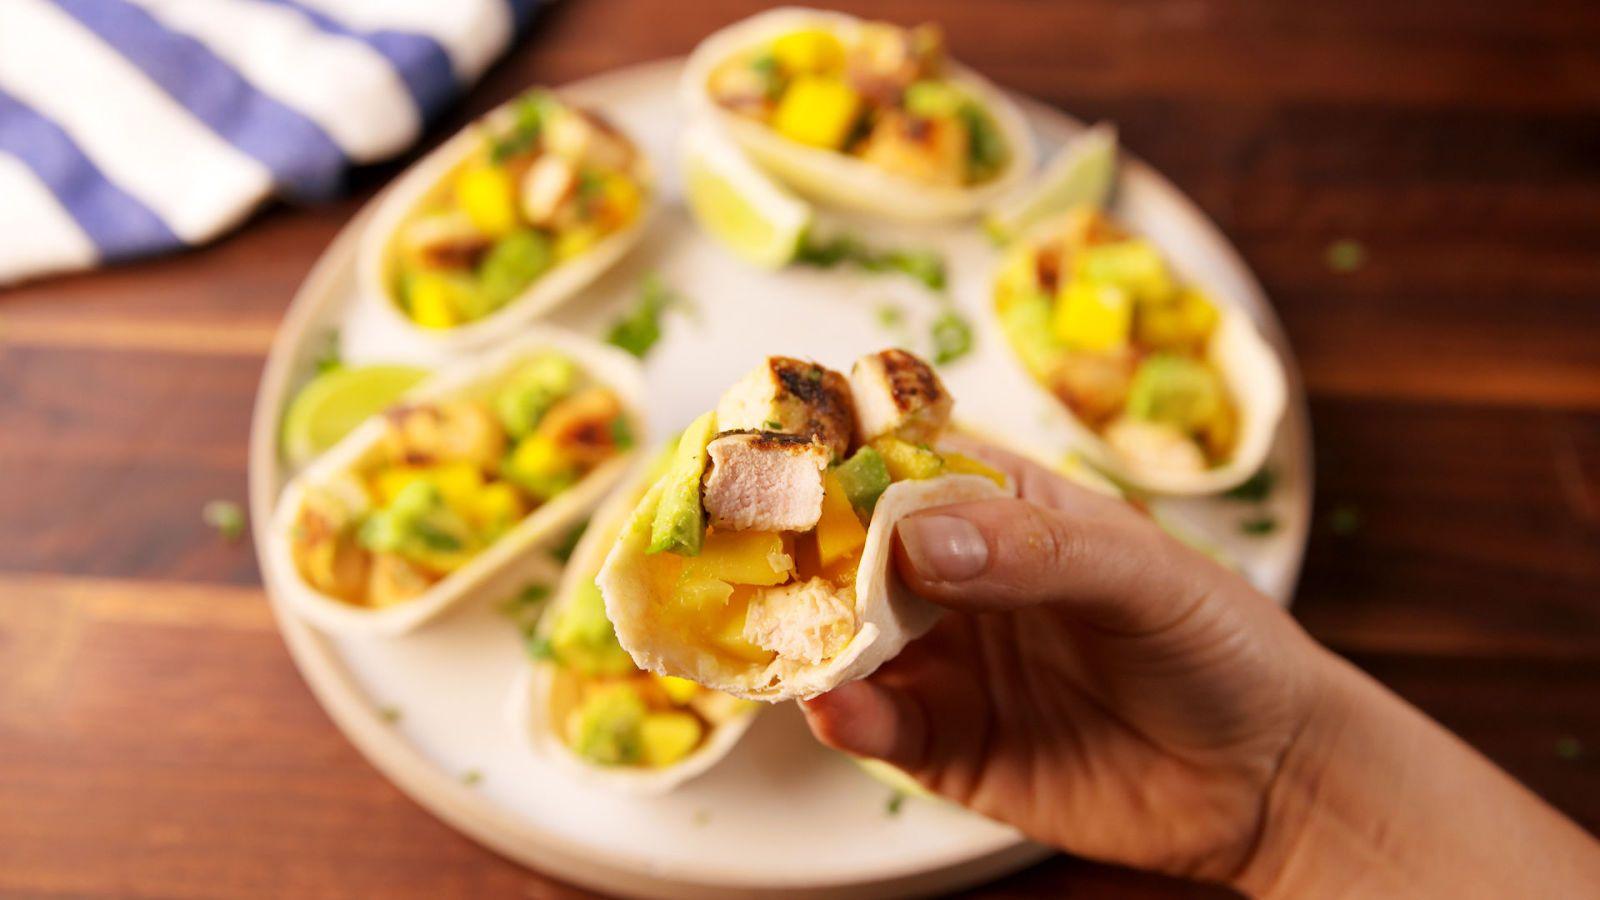 Amazing Mini Chicken Tacos Recipegolkes